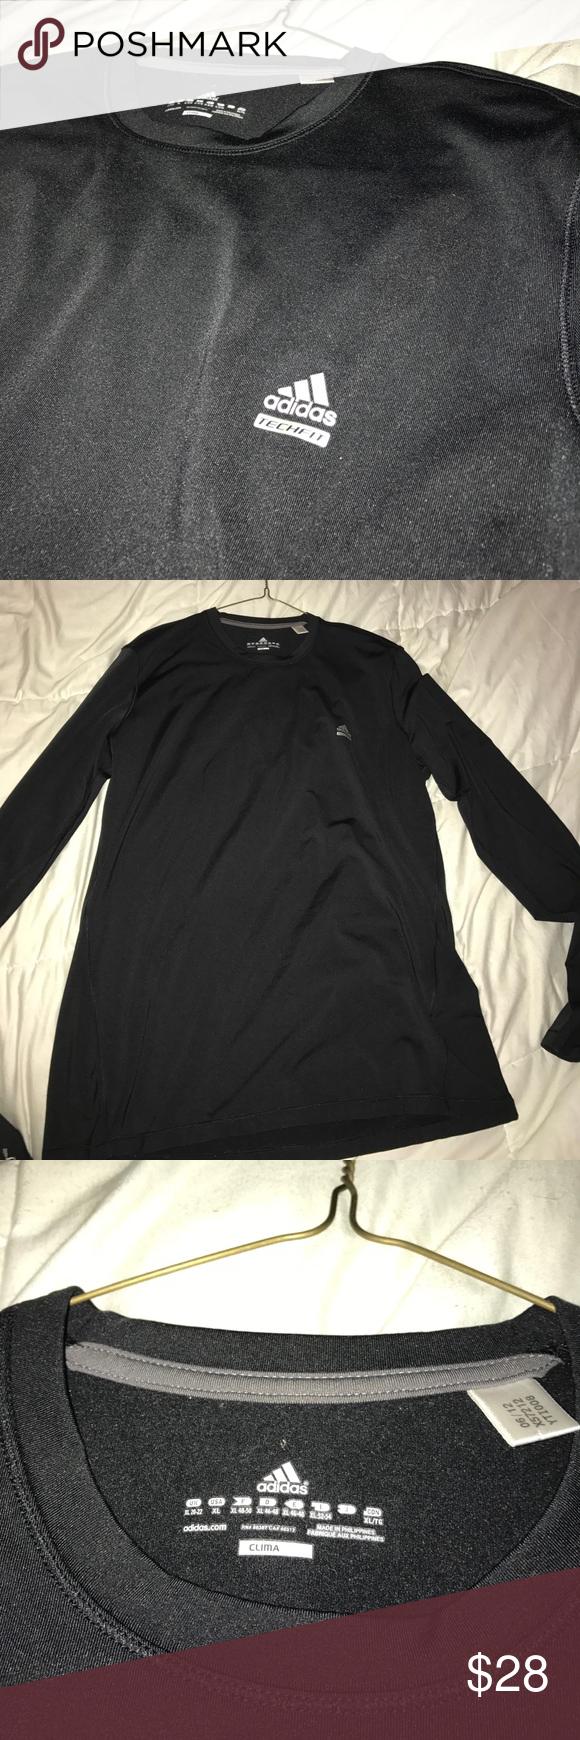 Adidas Techfit climalite running shirt Never worn before